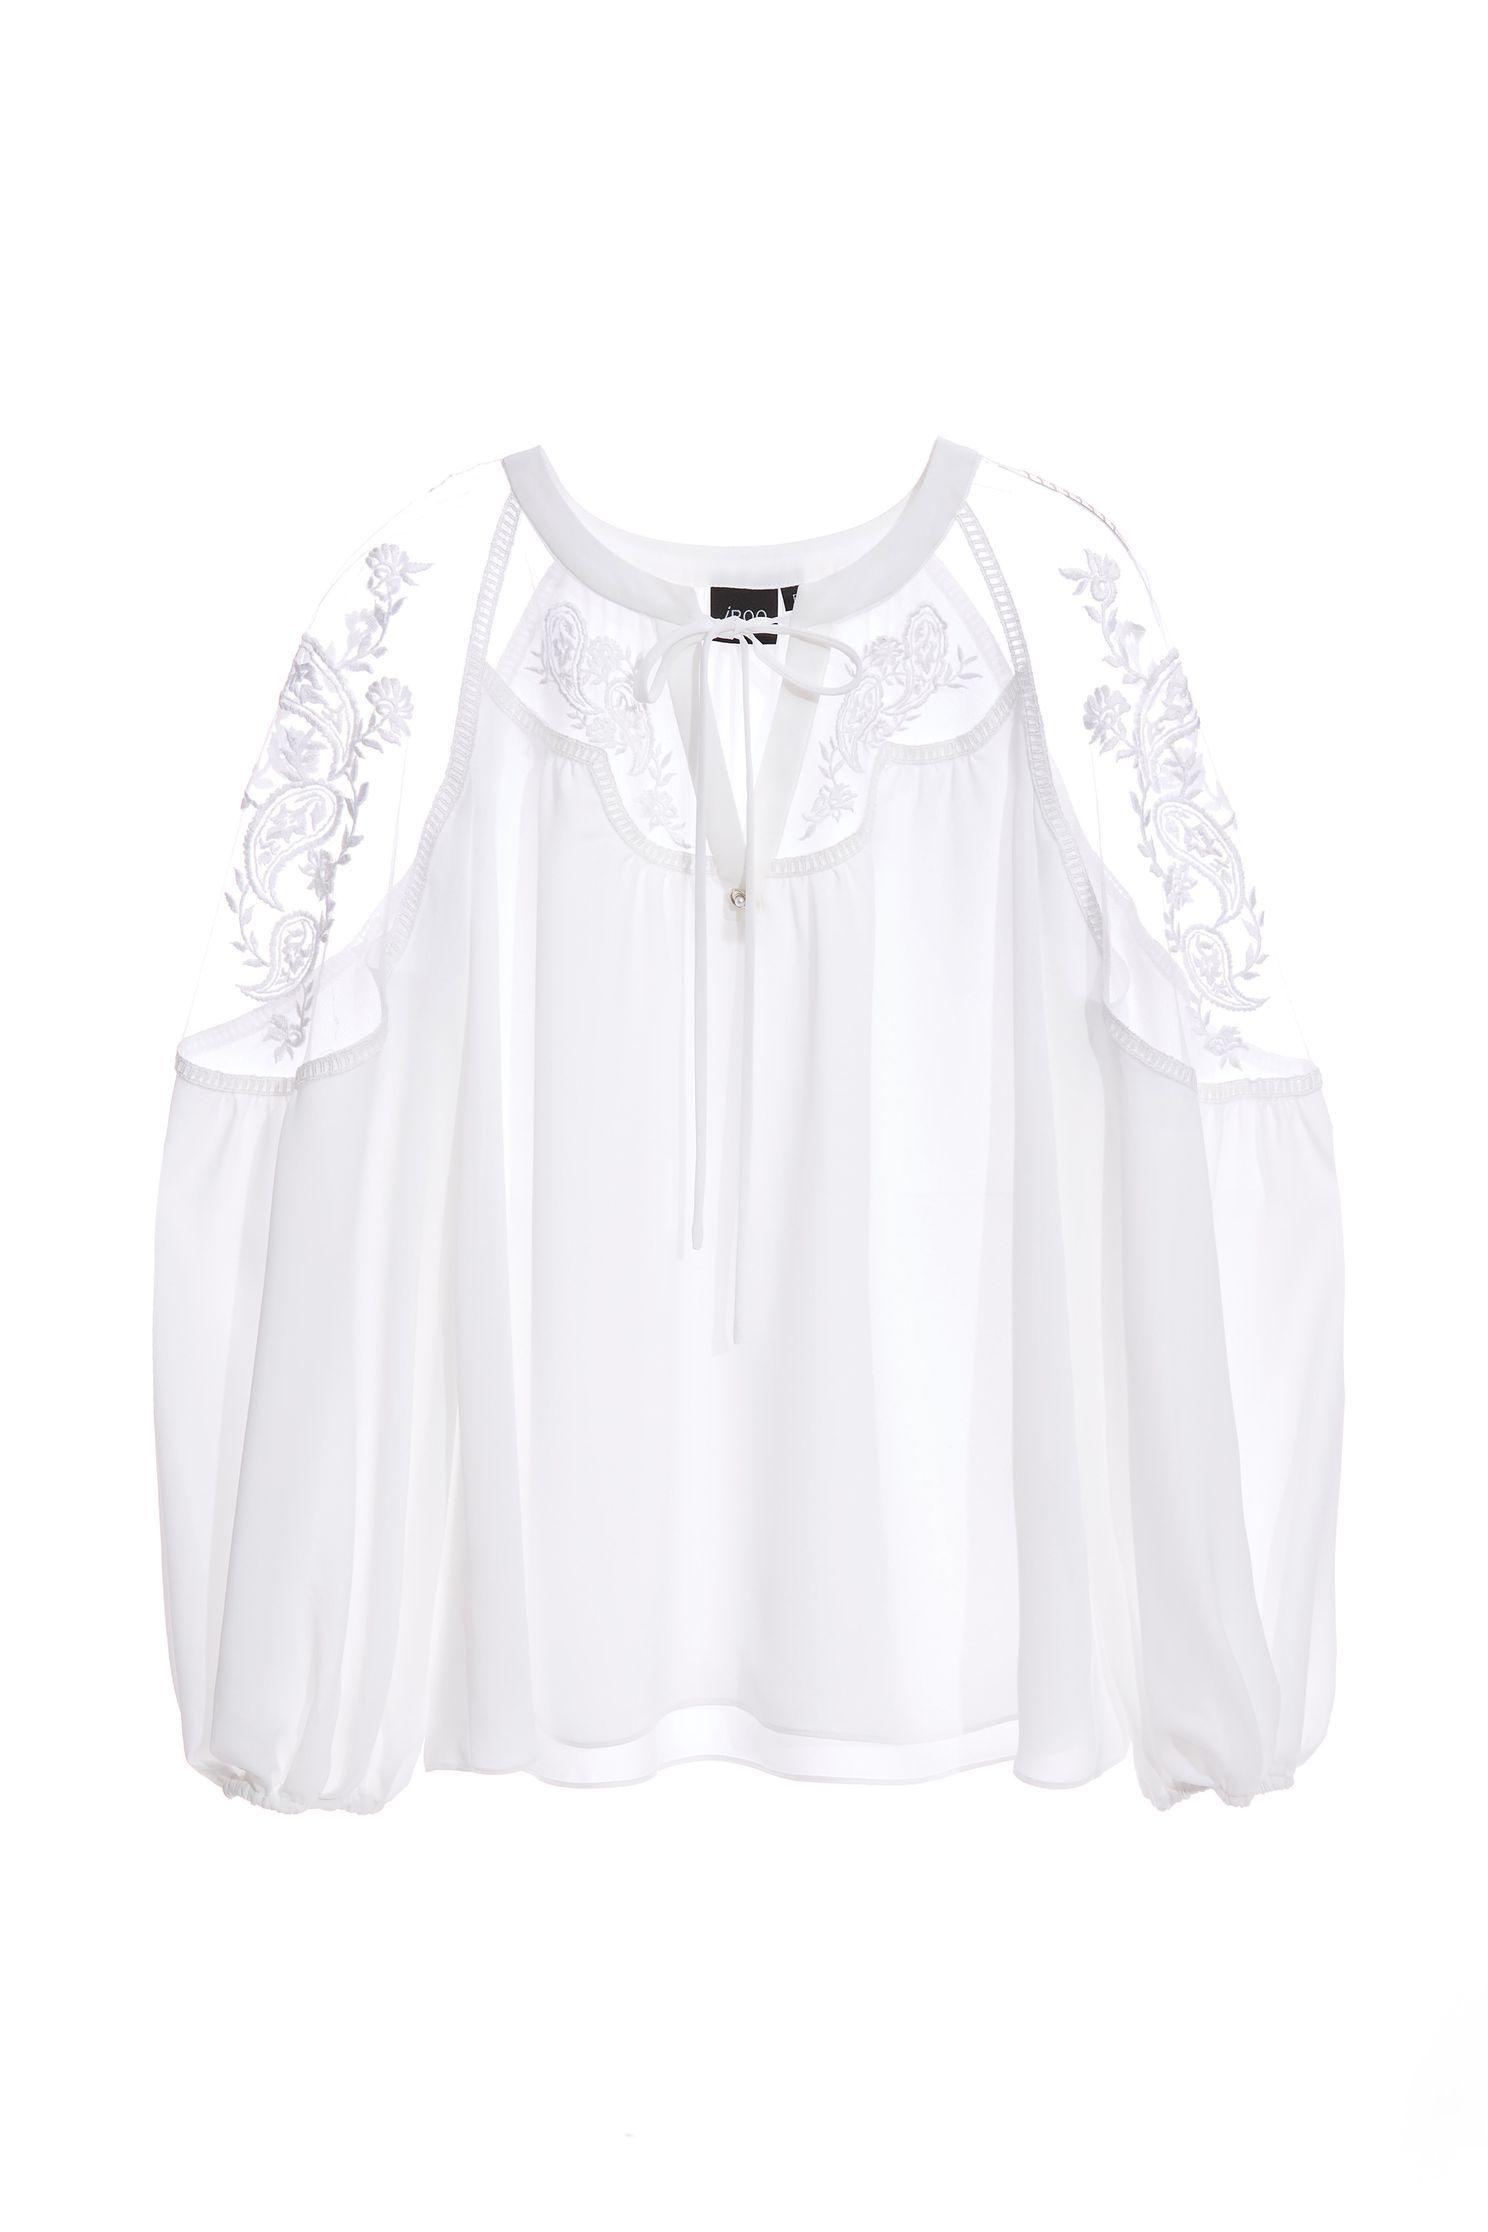 Bohemian embroiderey chiffon top,Tops,Embroidered,Season (AW) Look,Valentine,Lace,Chiffon,Chiffon tops